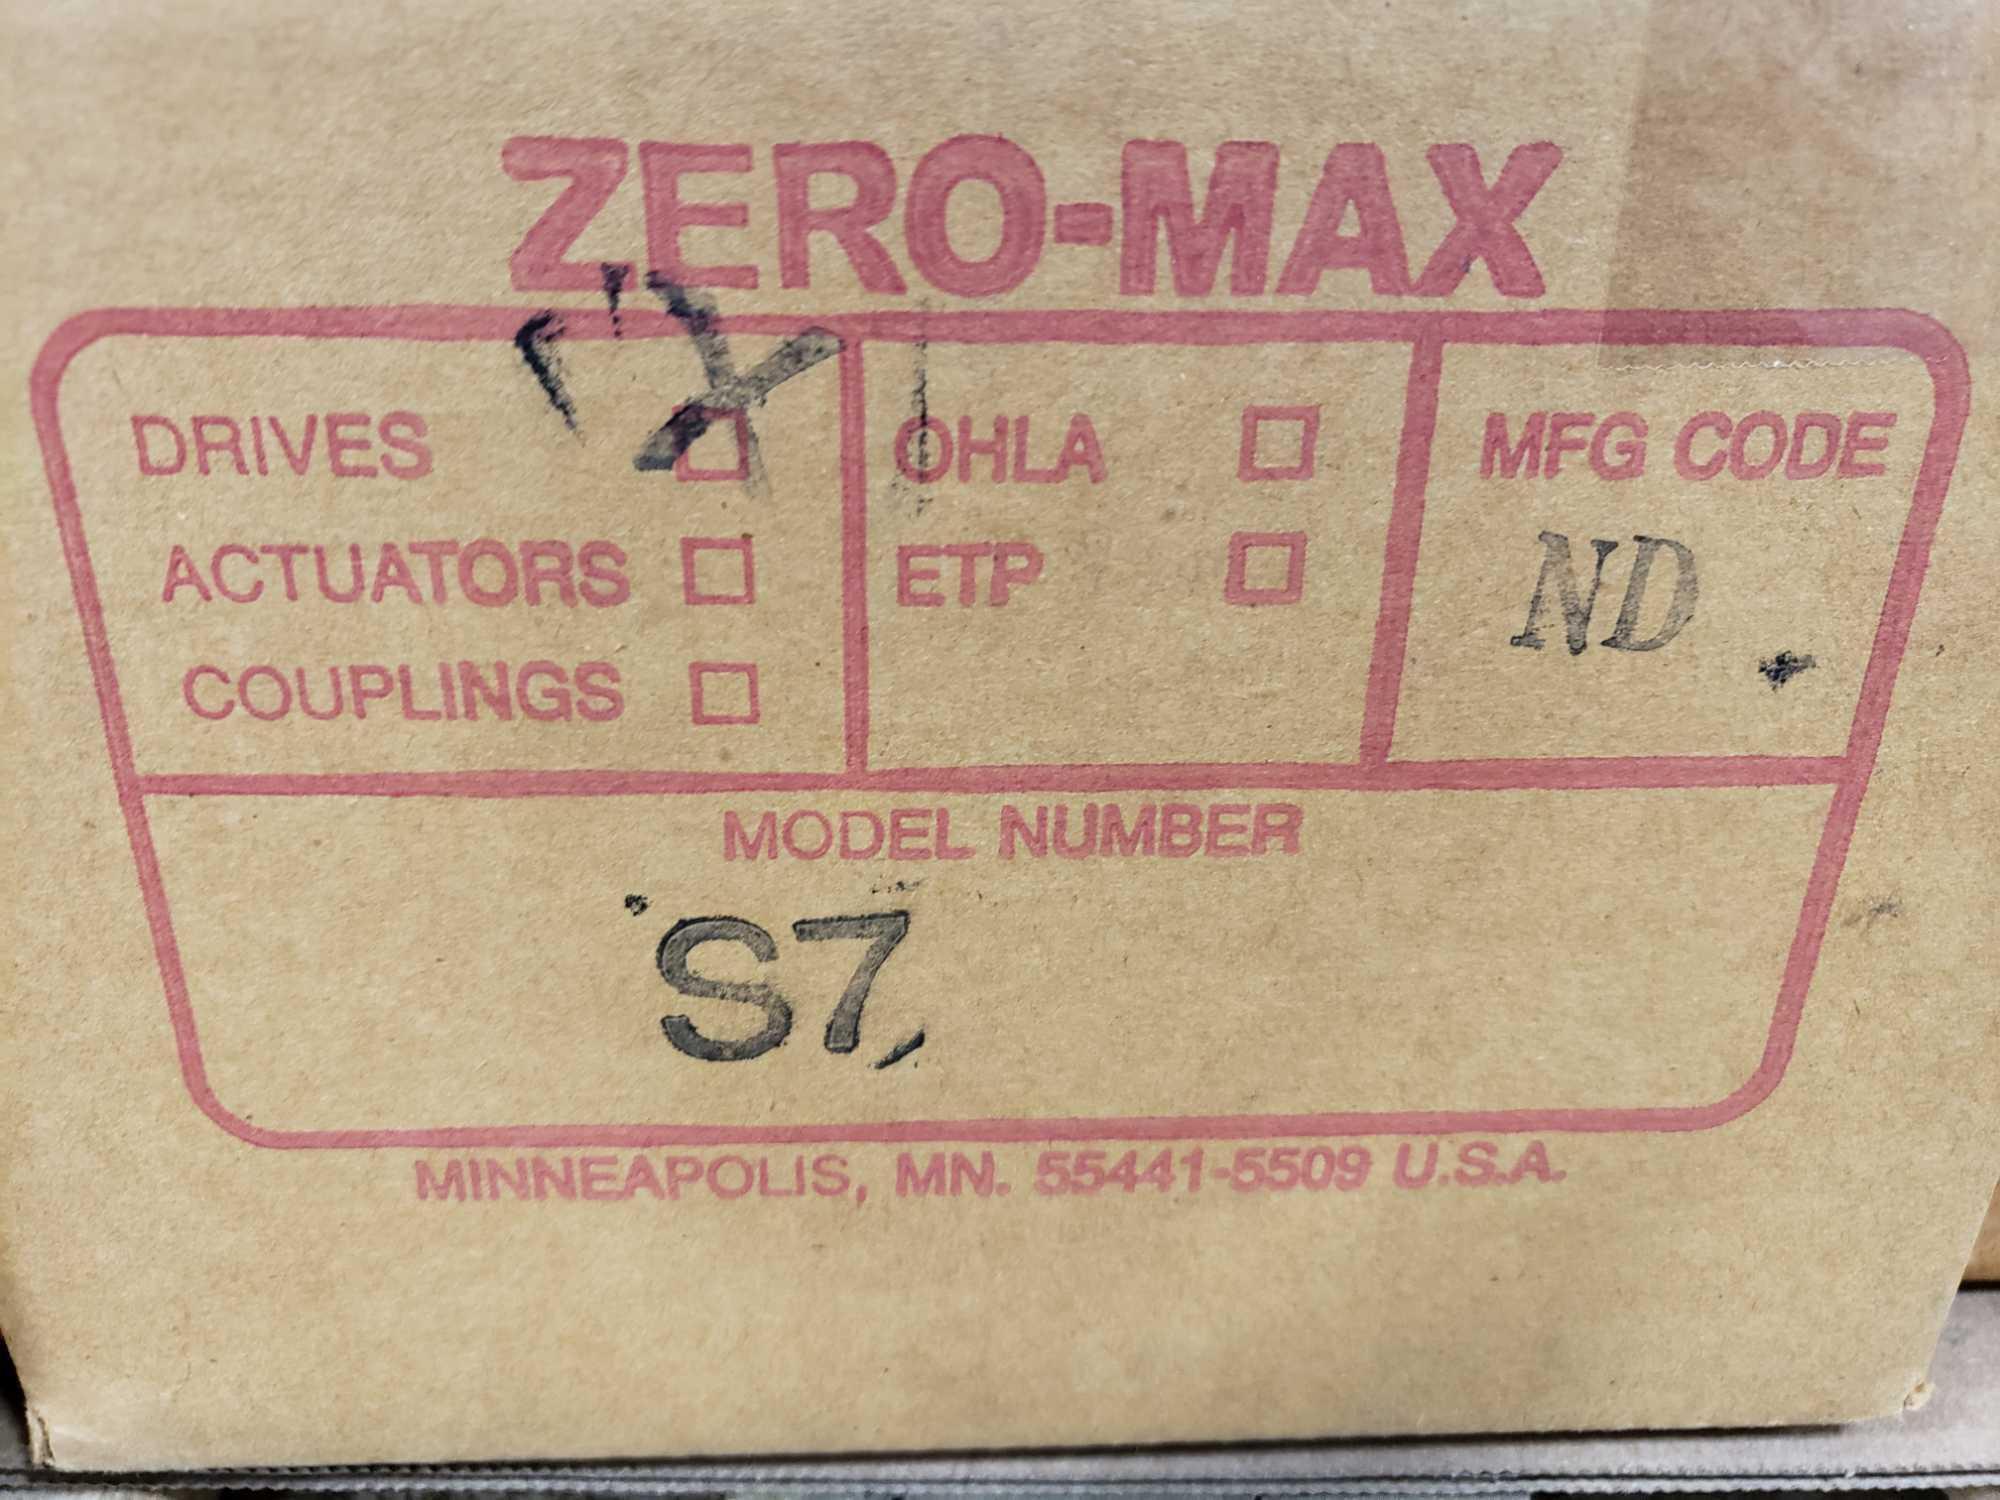 Zero-max gearhead power block model S7, 0-20 output rotation, 12lb torque, 20:1 range. New in box. - Image 3 of 3